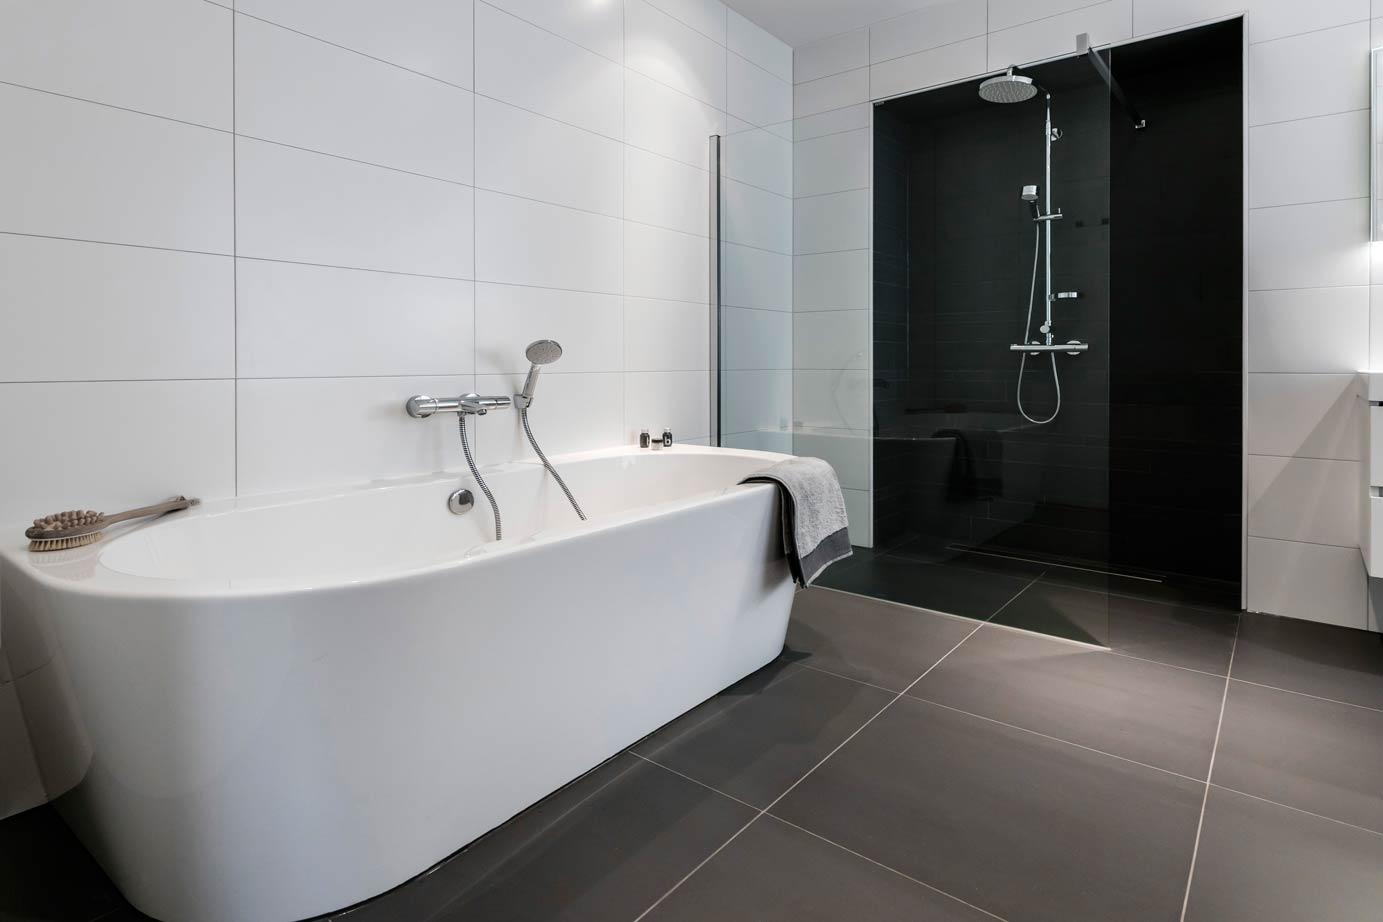 badkamers. ruime keus, vele stijlen. lage prijzen. - db keukens, Badkamer